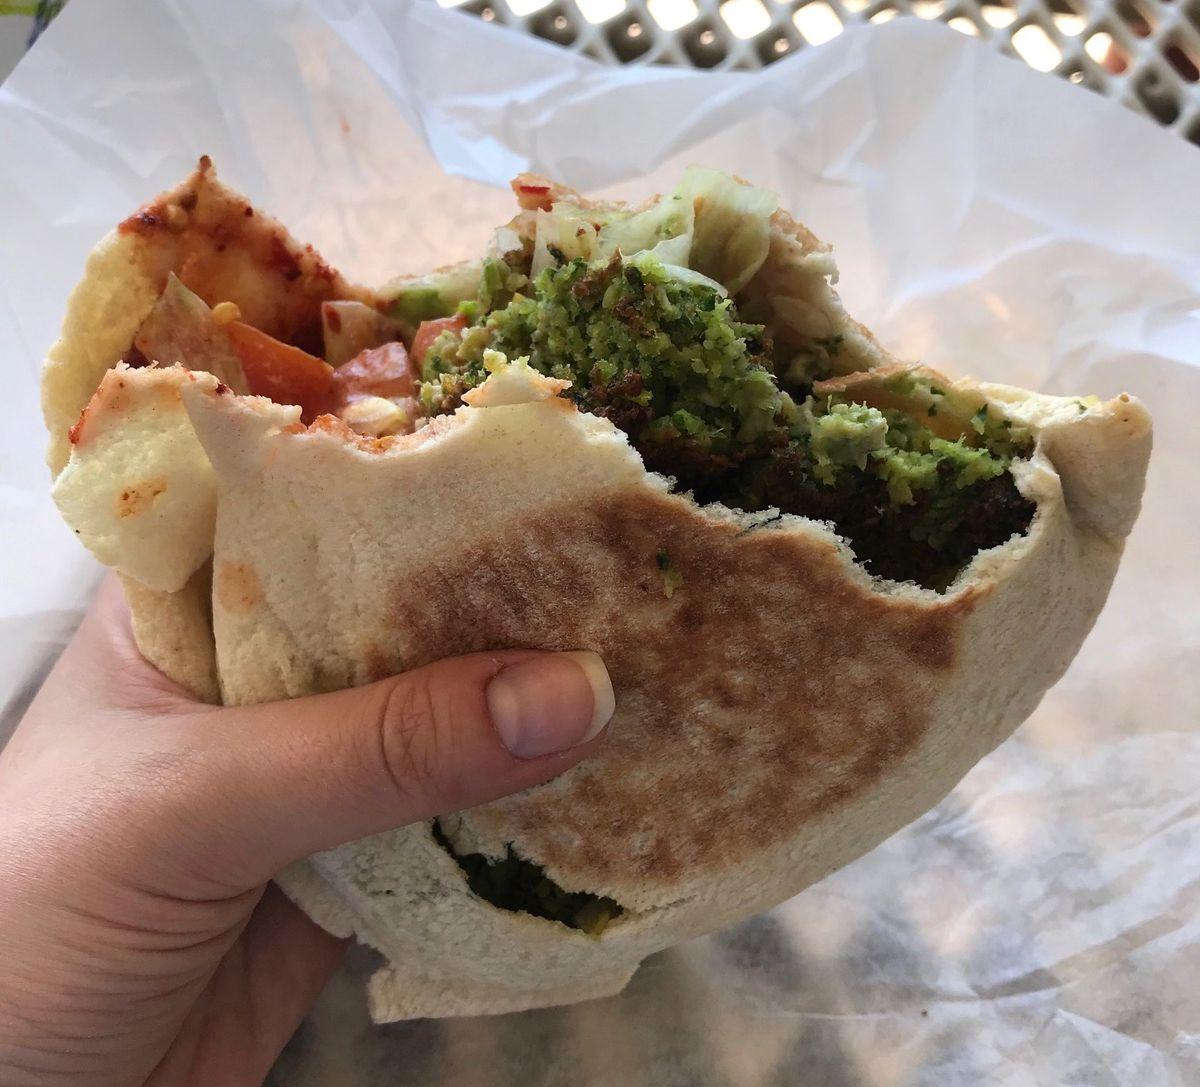 Falafel pita sandwich at Falafel Drive In